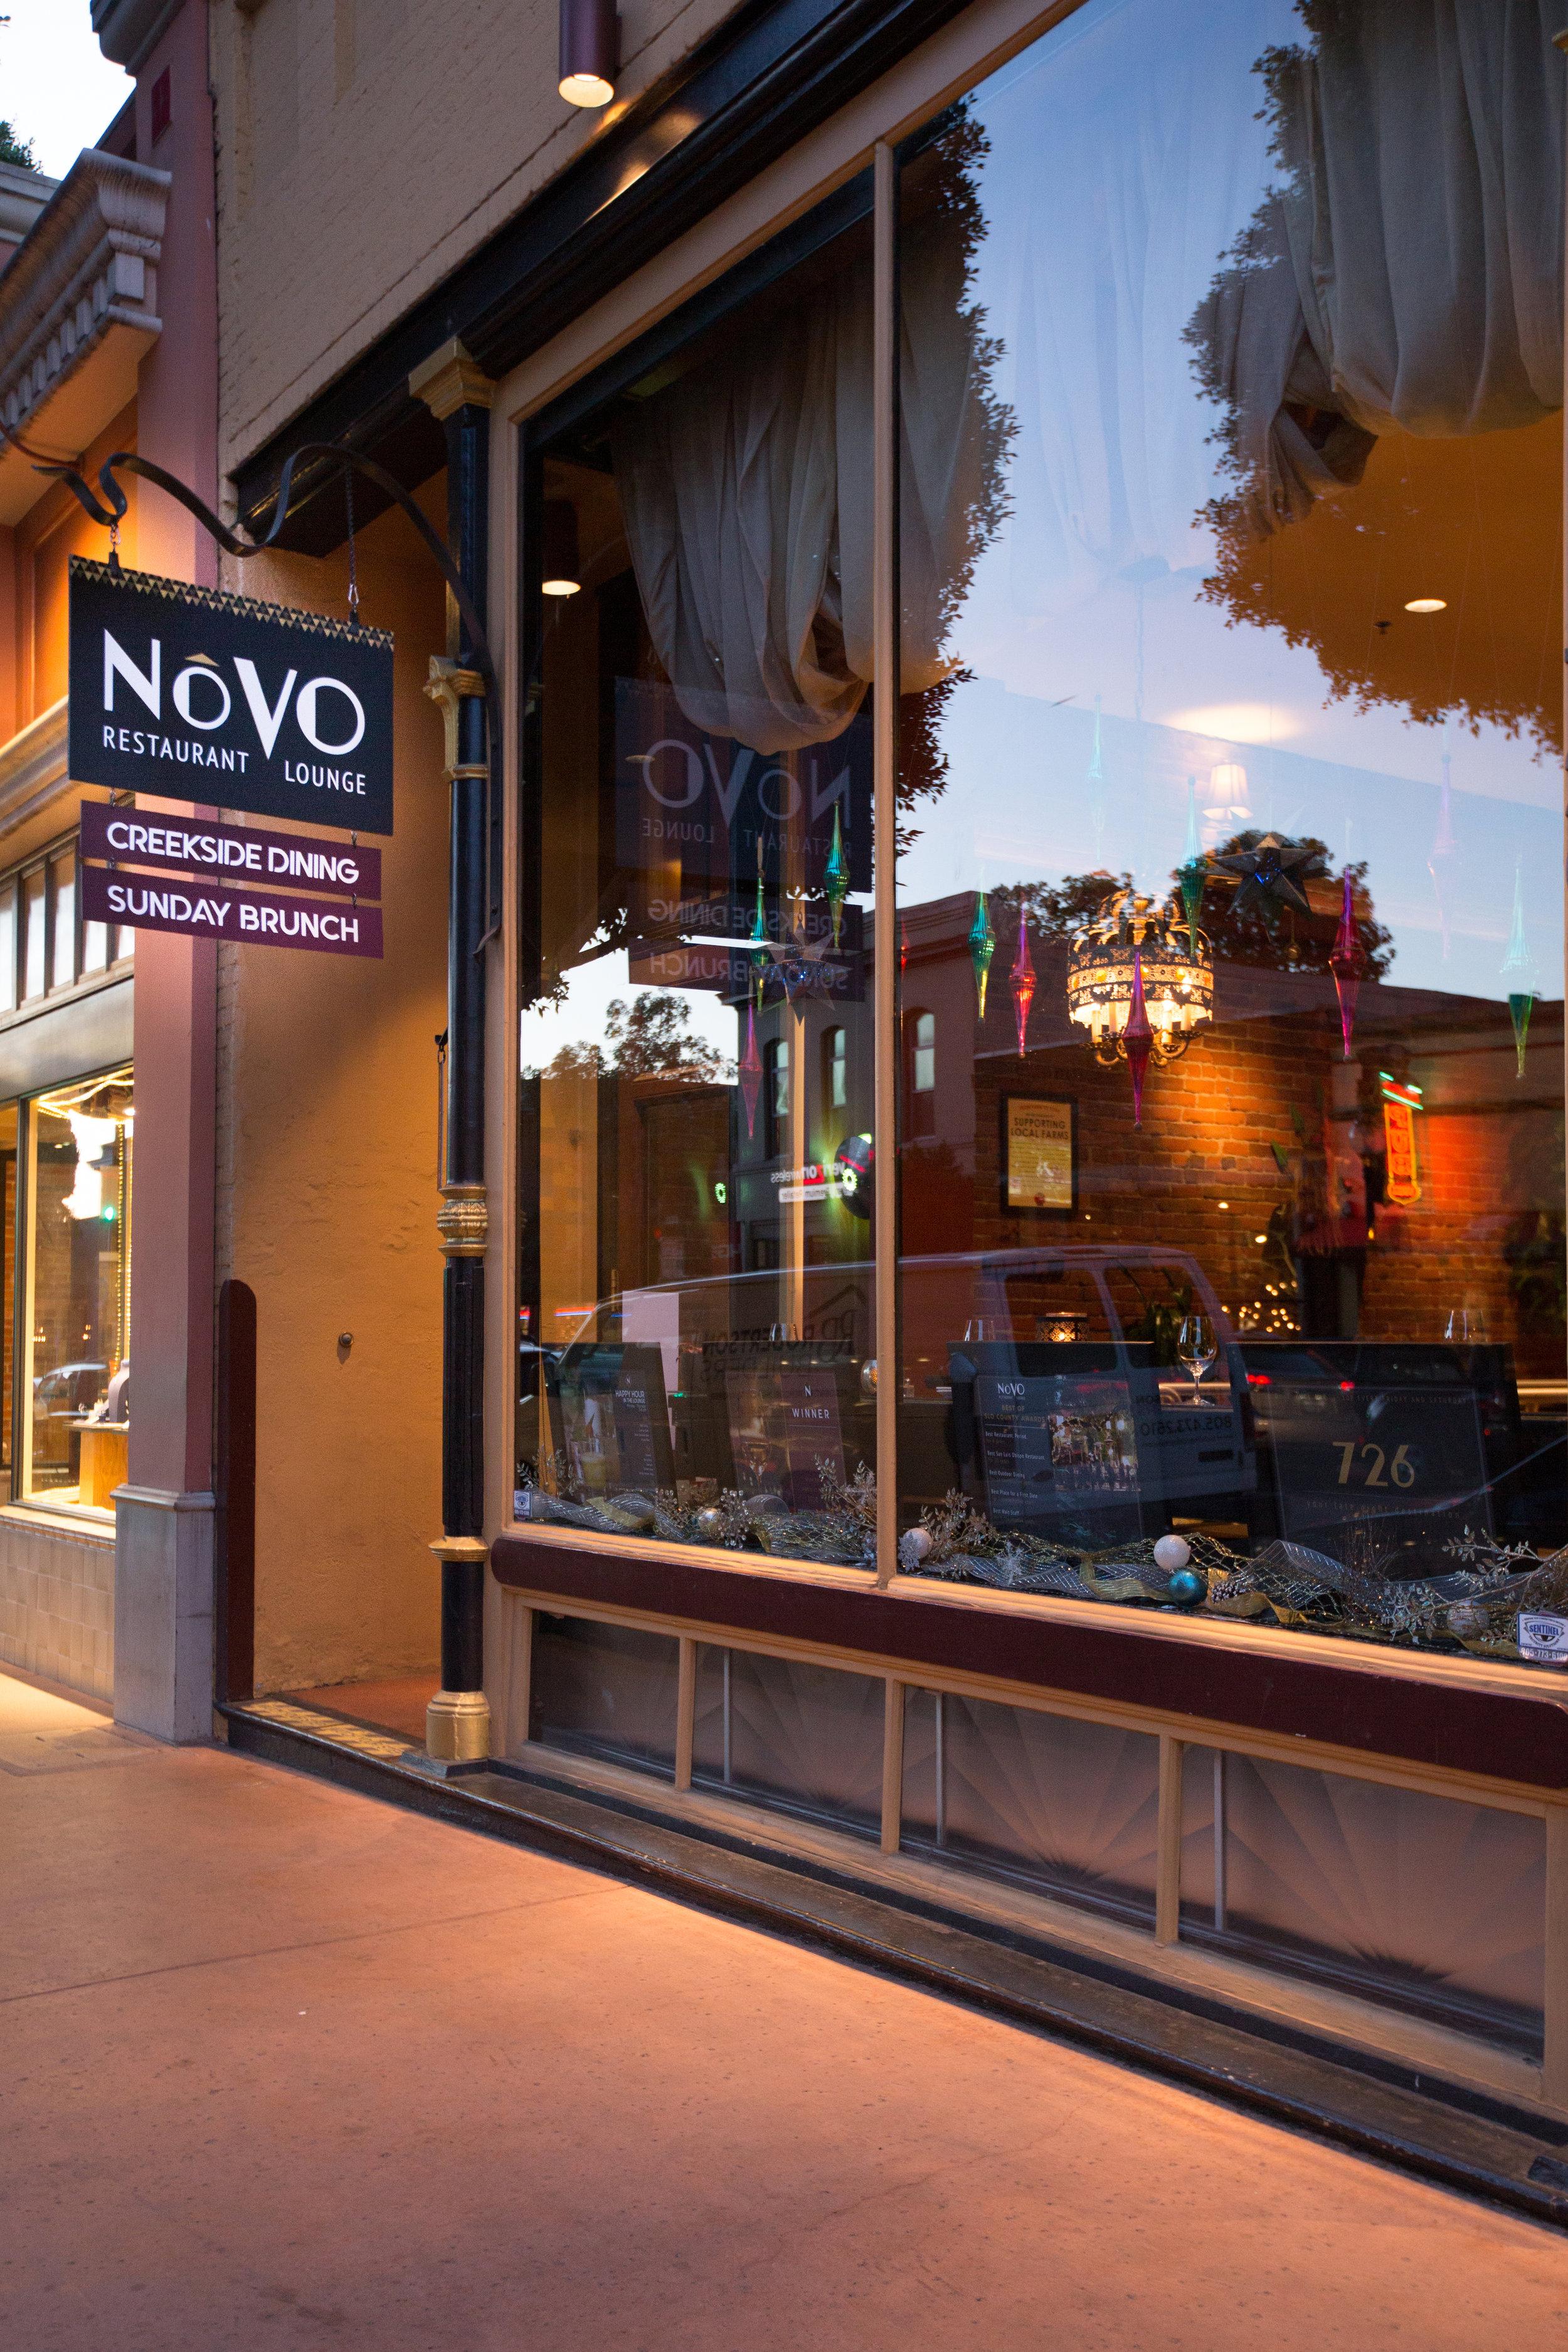 novo-restaurant-lounge-patio-26-v2.jpg